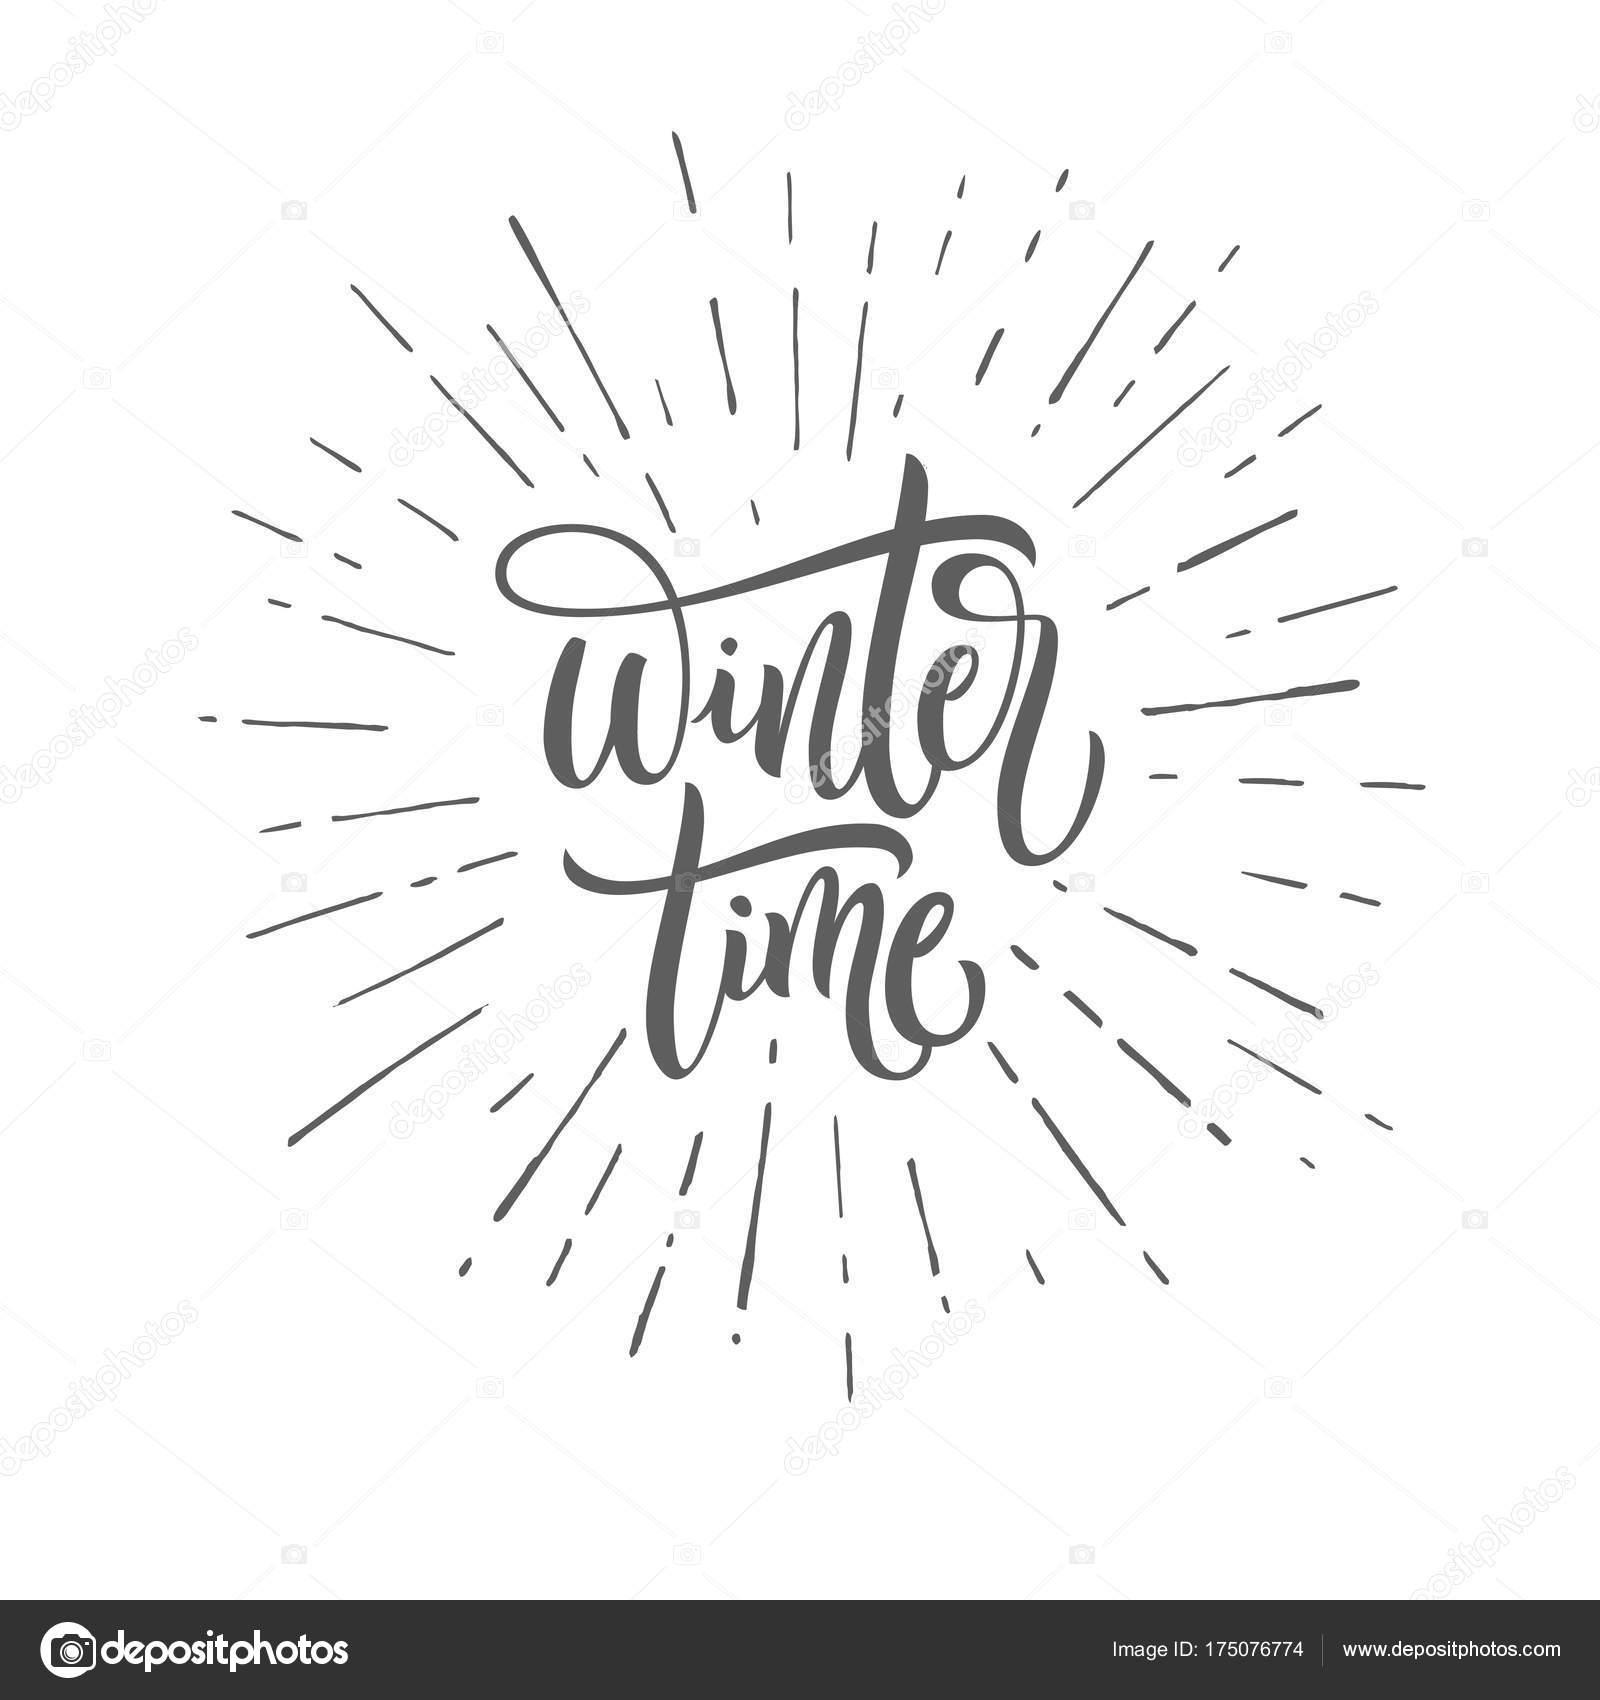 Winter Zeit Schwarz Weiß Handgeschriebenen Schriftzug Inschrift